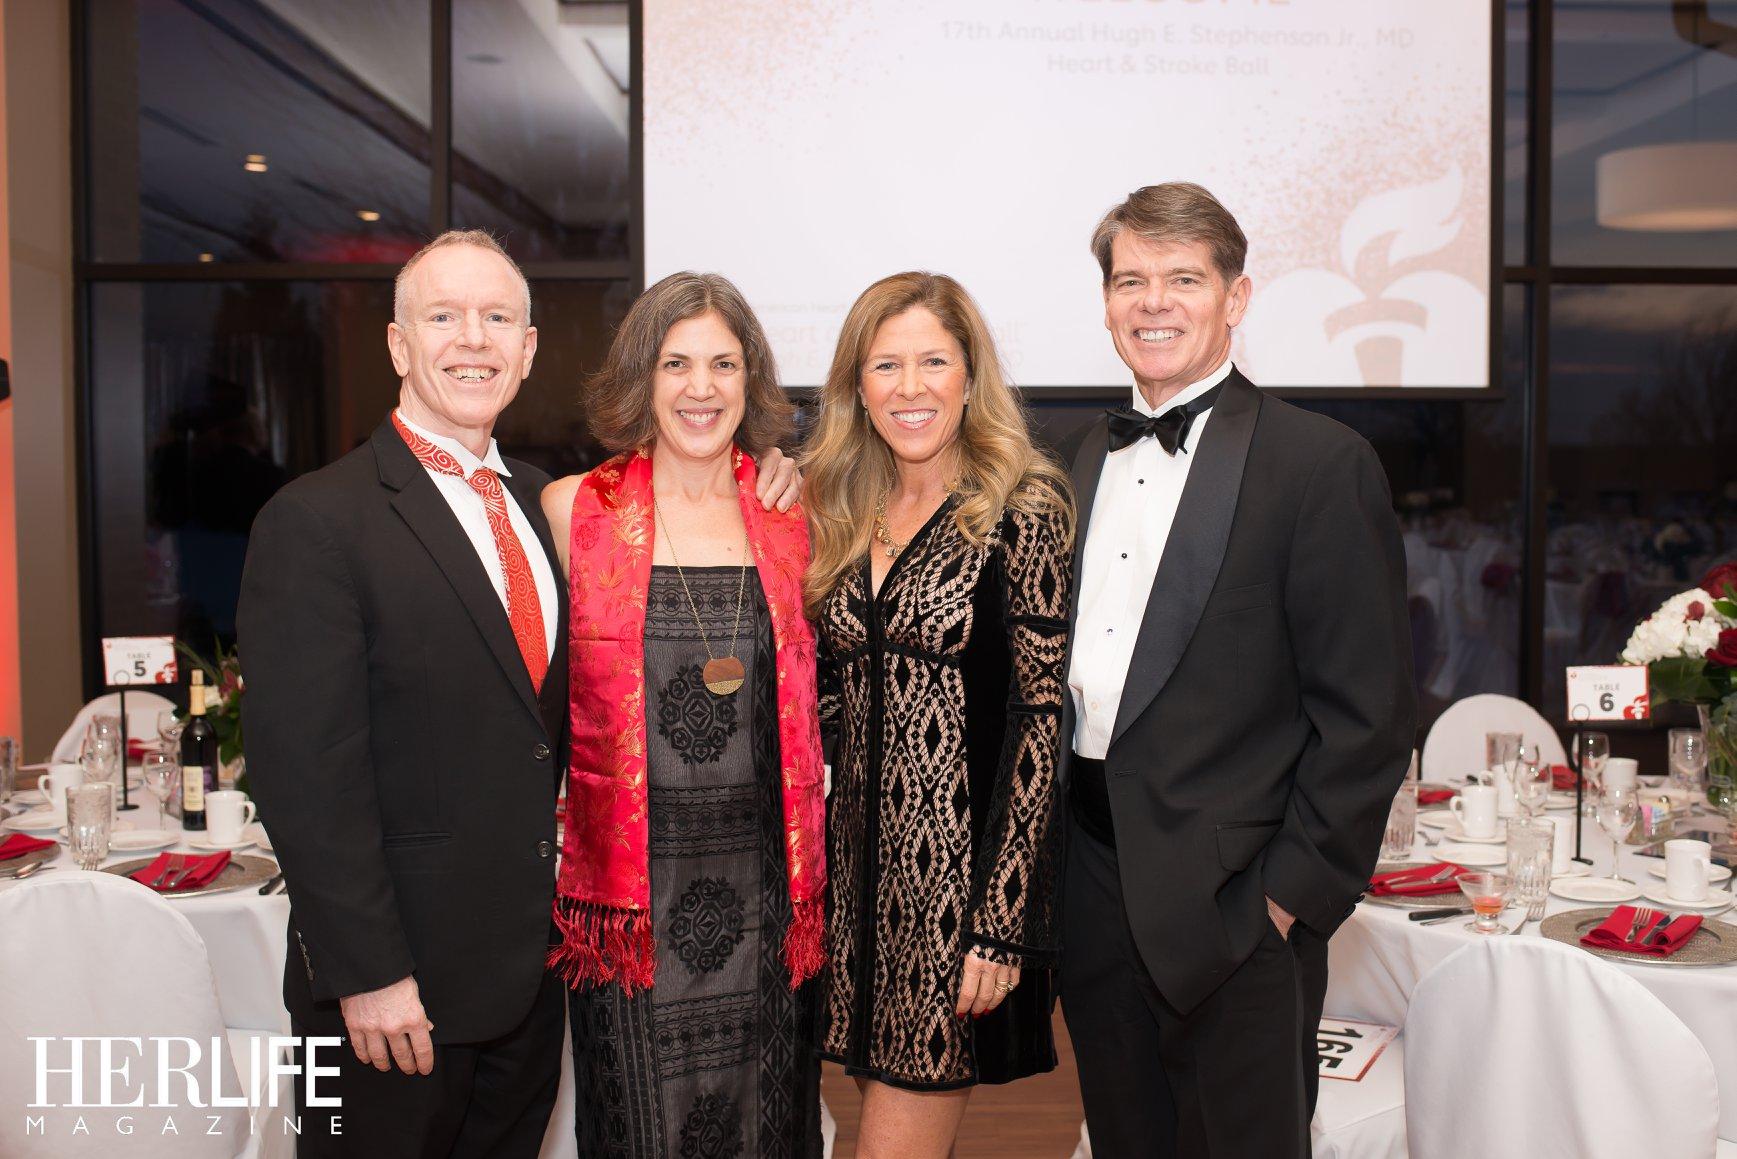 Photo: Dr. & Mrs. Stavely-O'Carroll & Ann & Alex Cameron